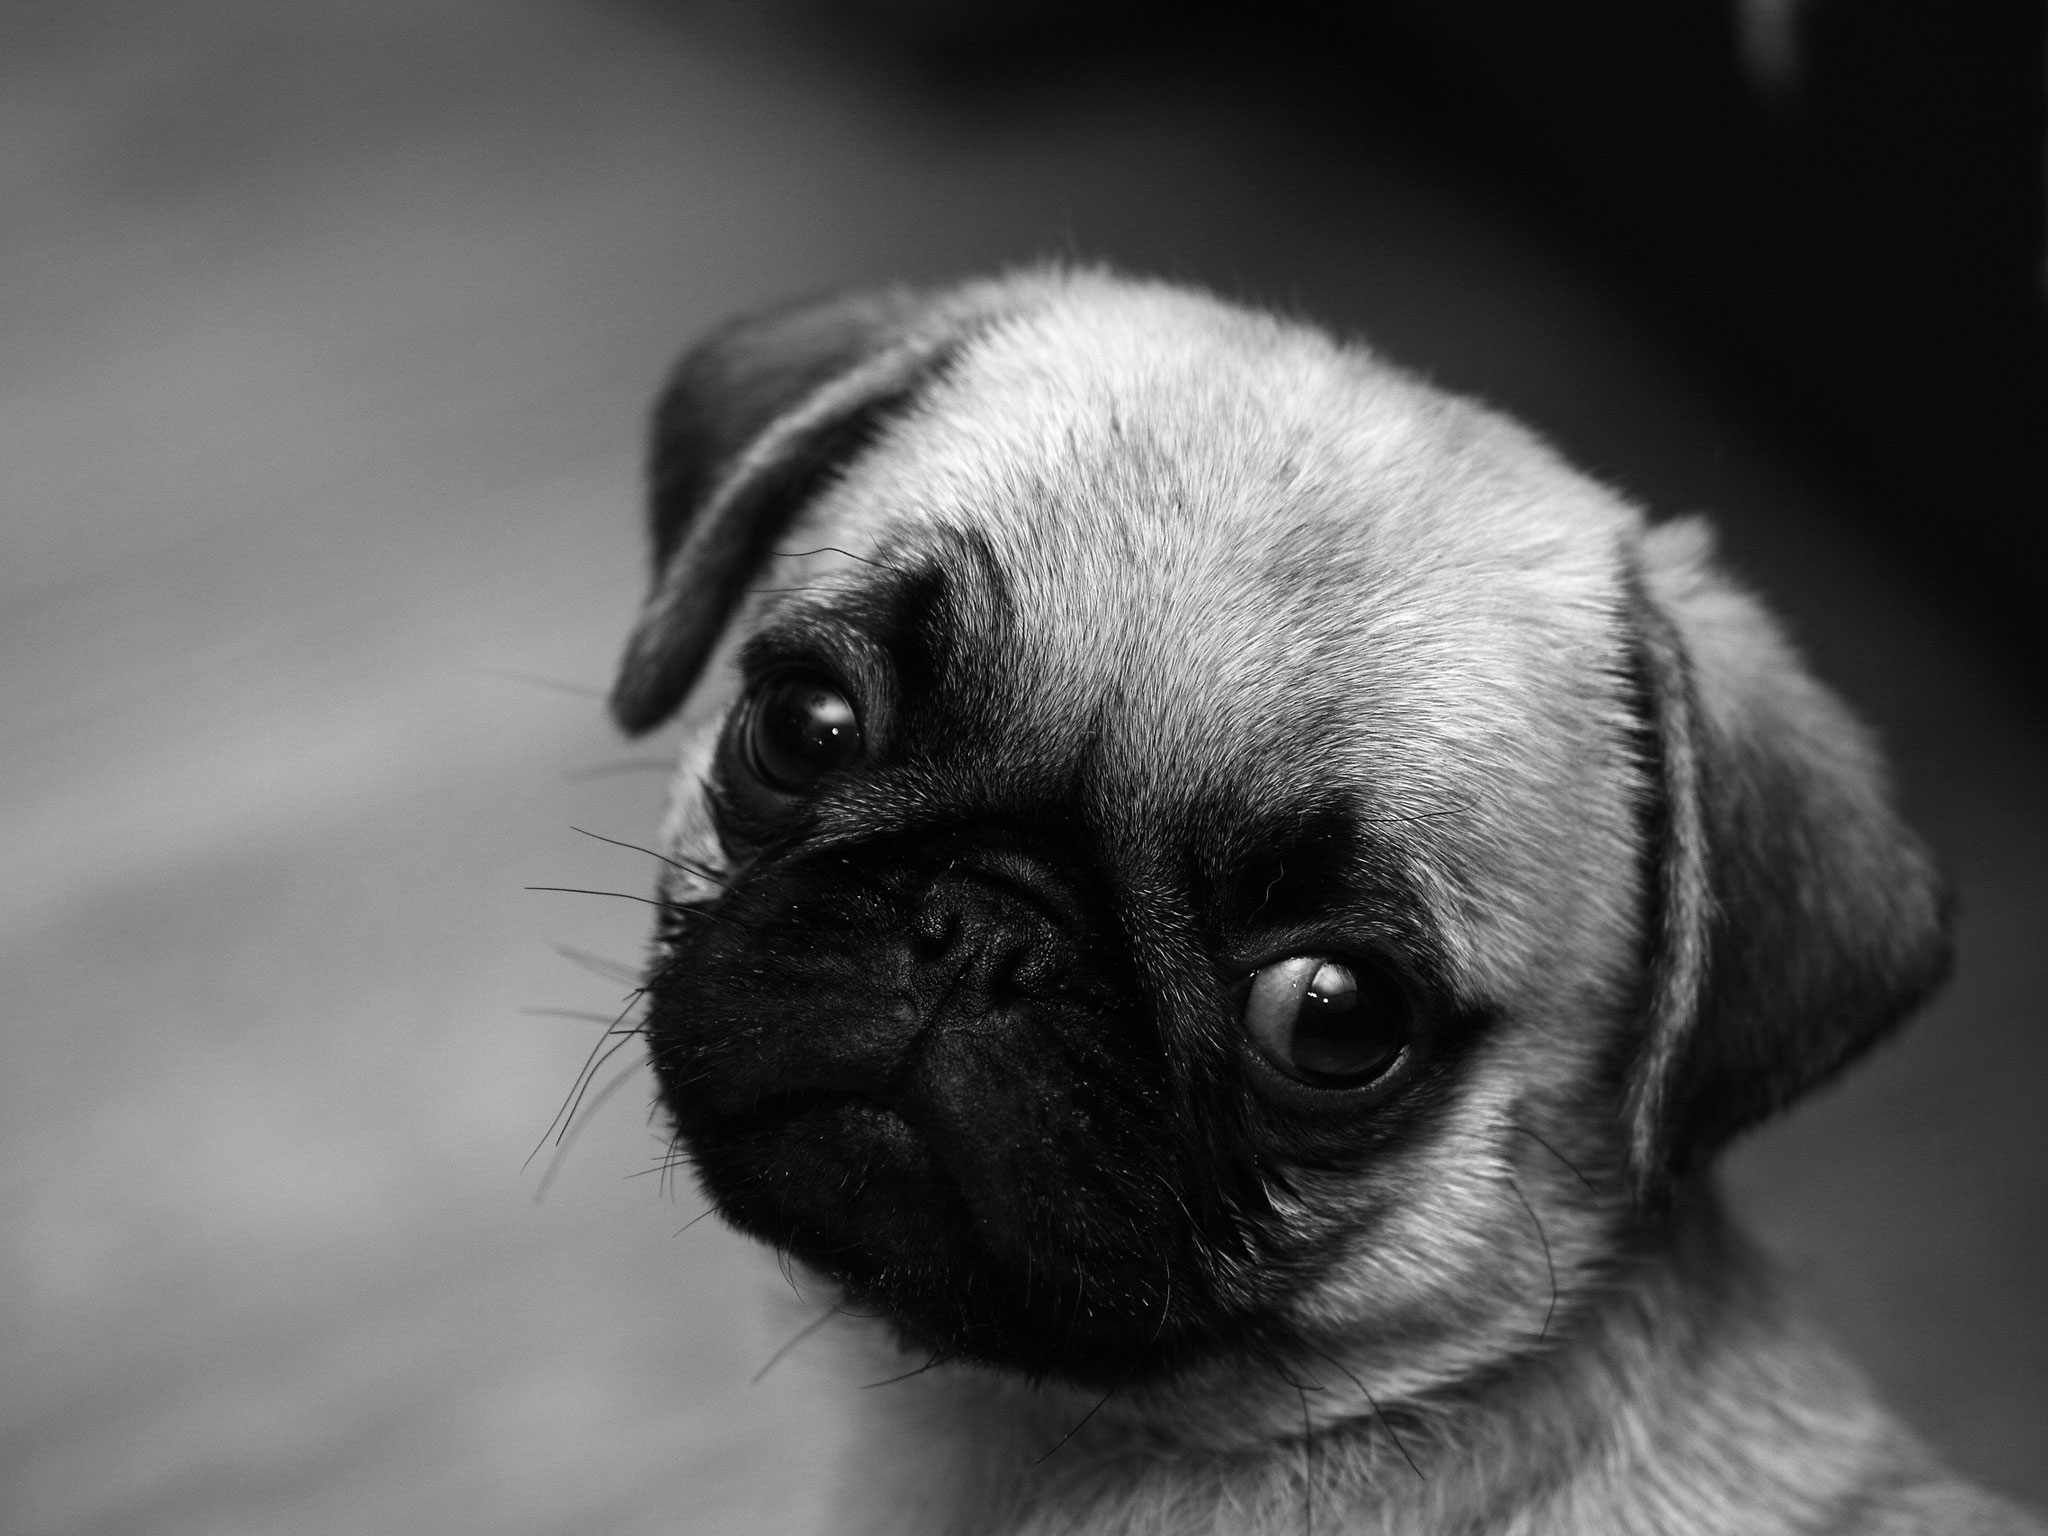 Cute Pug Wallpapers 2048x1536